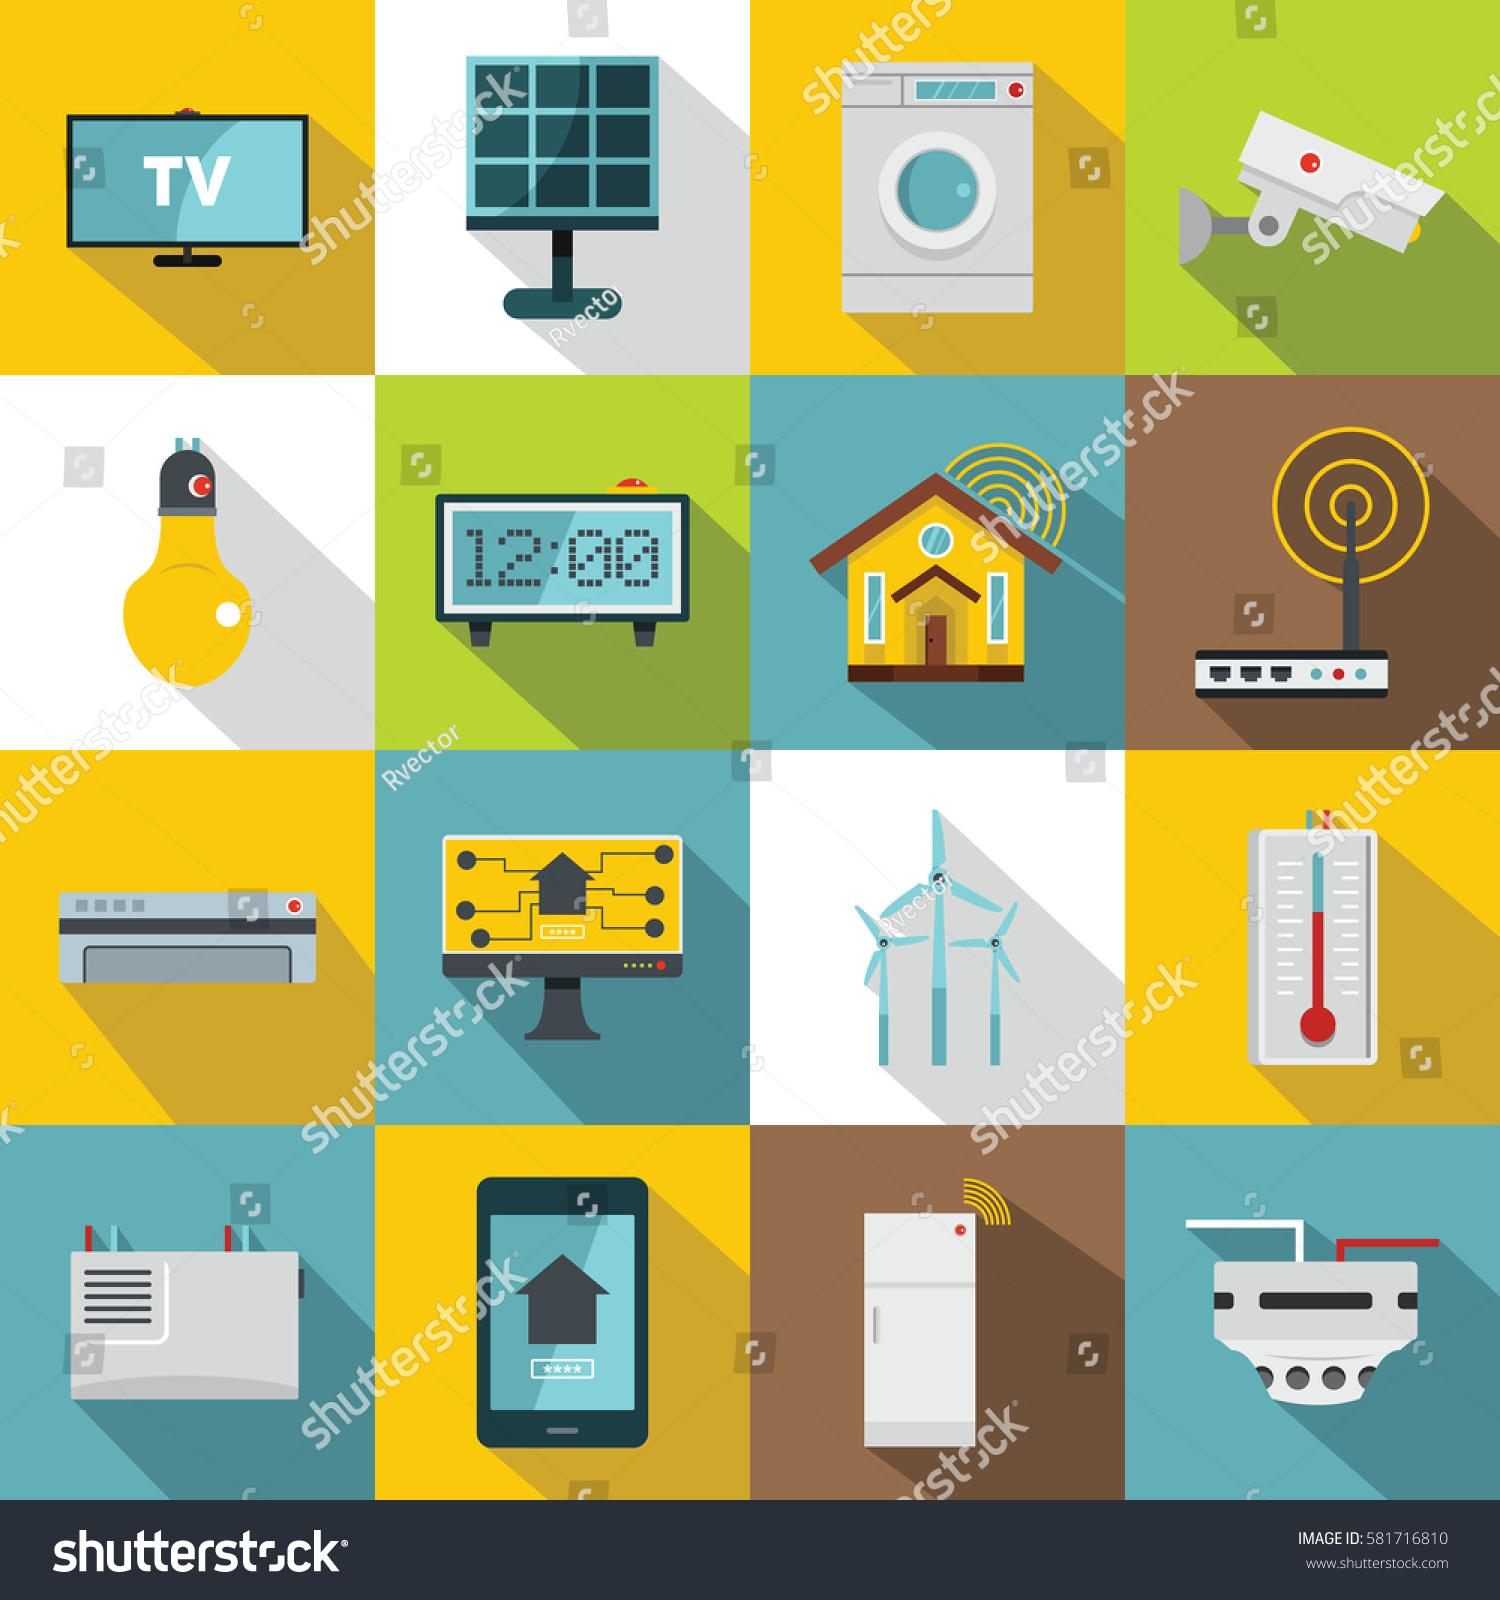 smart home house icons set flat stock vector 581716810 shutterstock. Black Bedroom Furniture Sets. Home Design Ideas